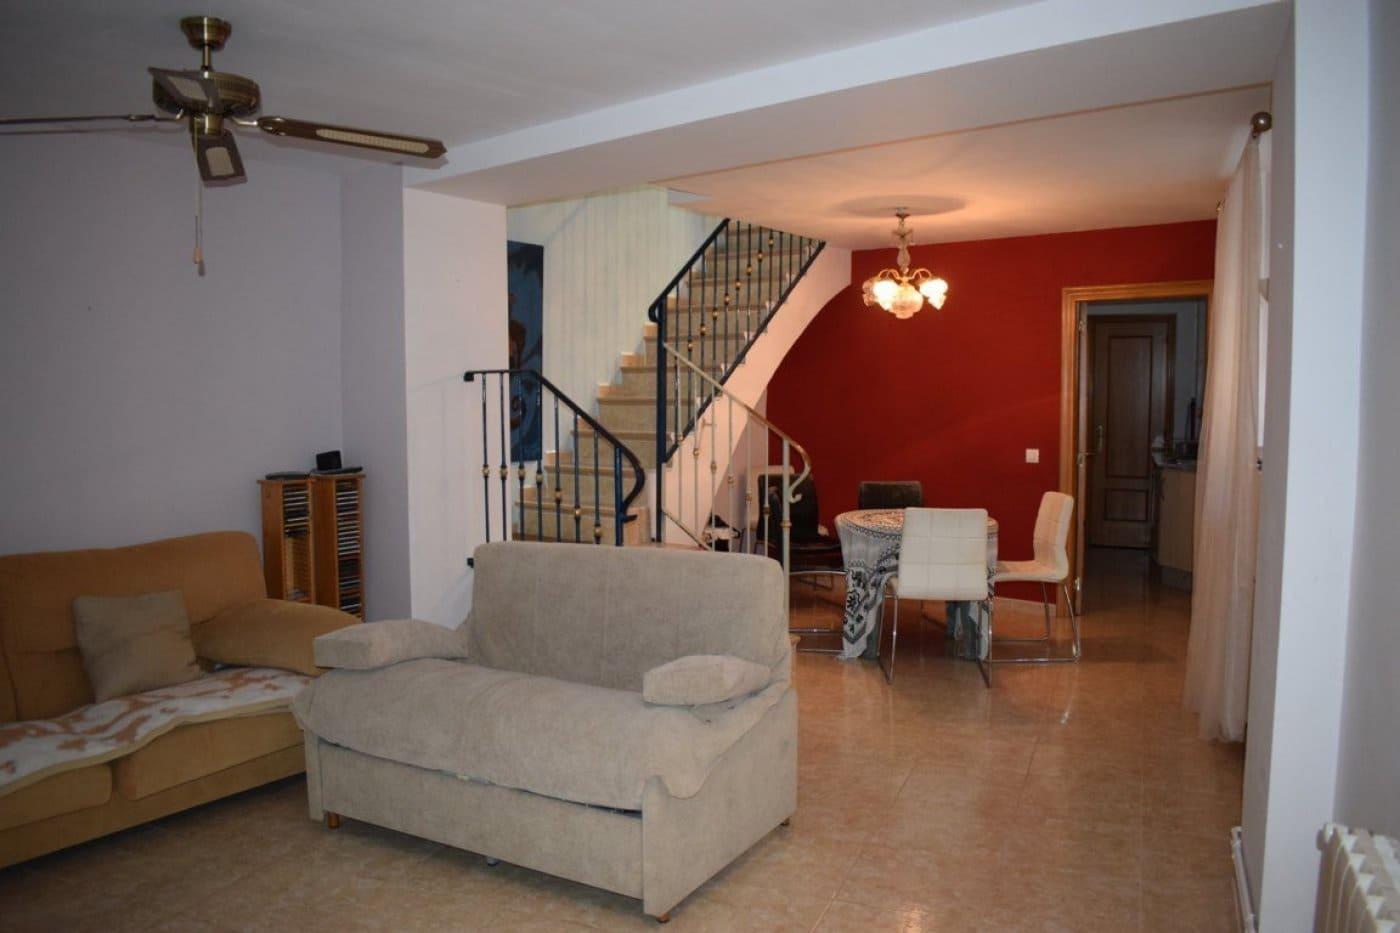 3 bedroom Townhouse for sale in Lliria - € 62,000 (Ref: 5159162)